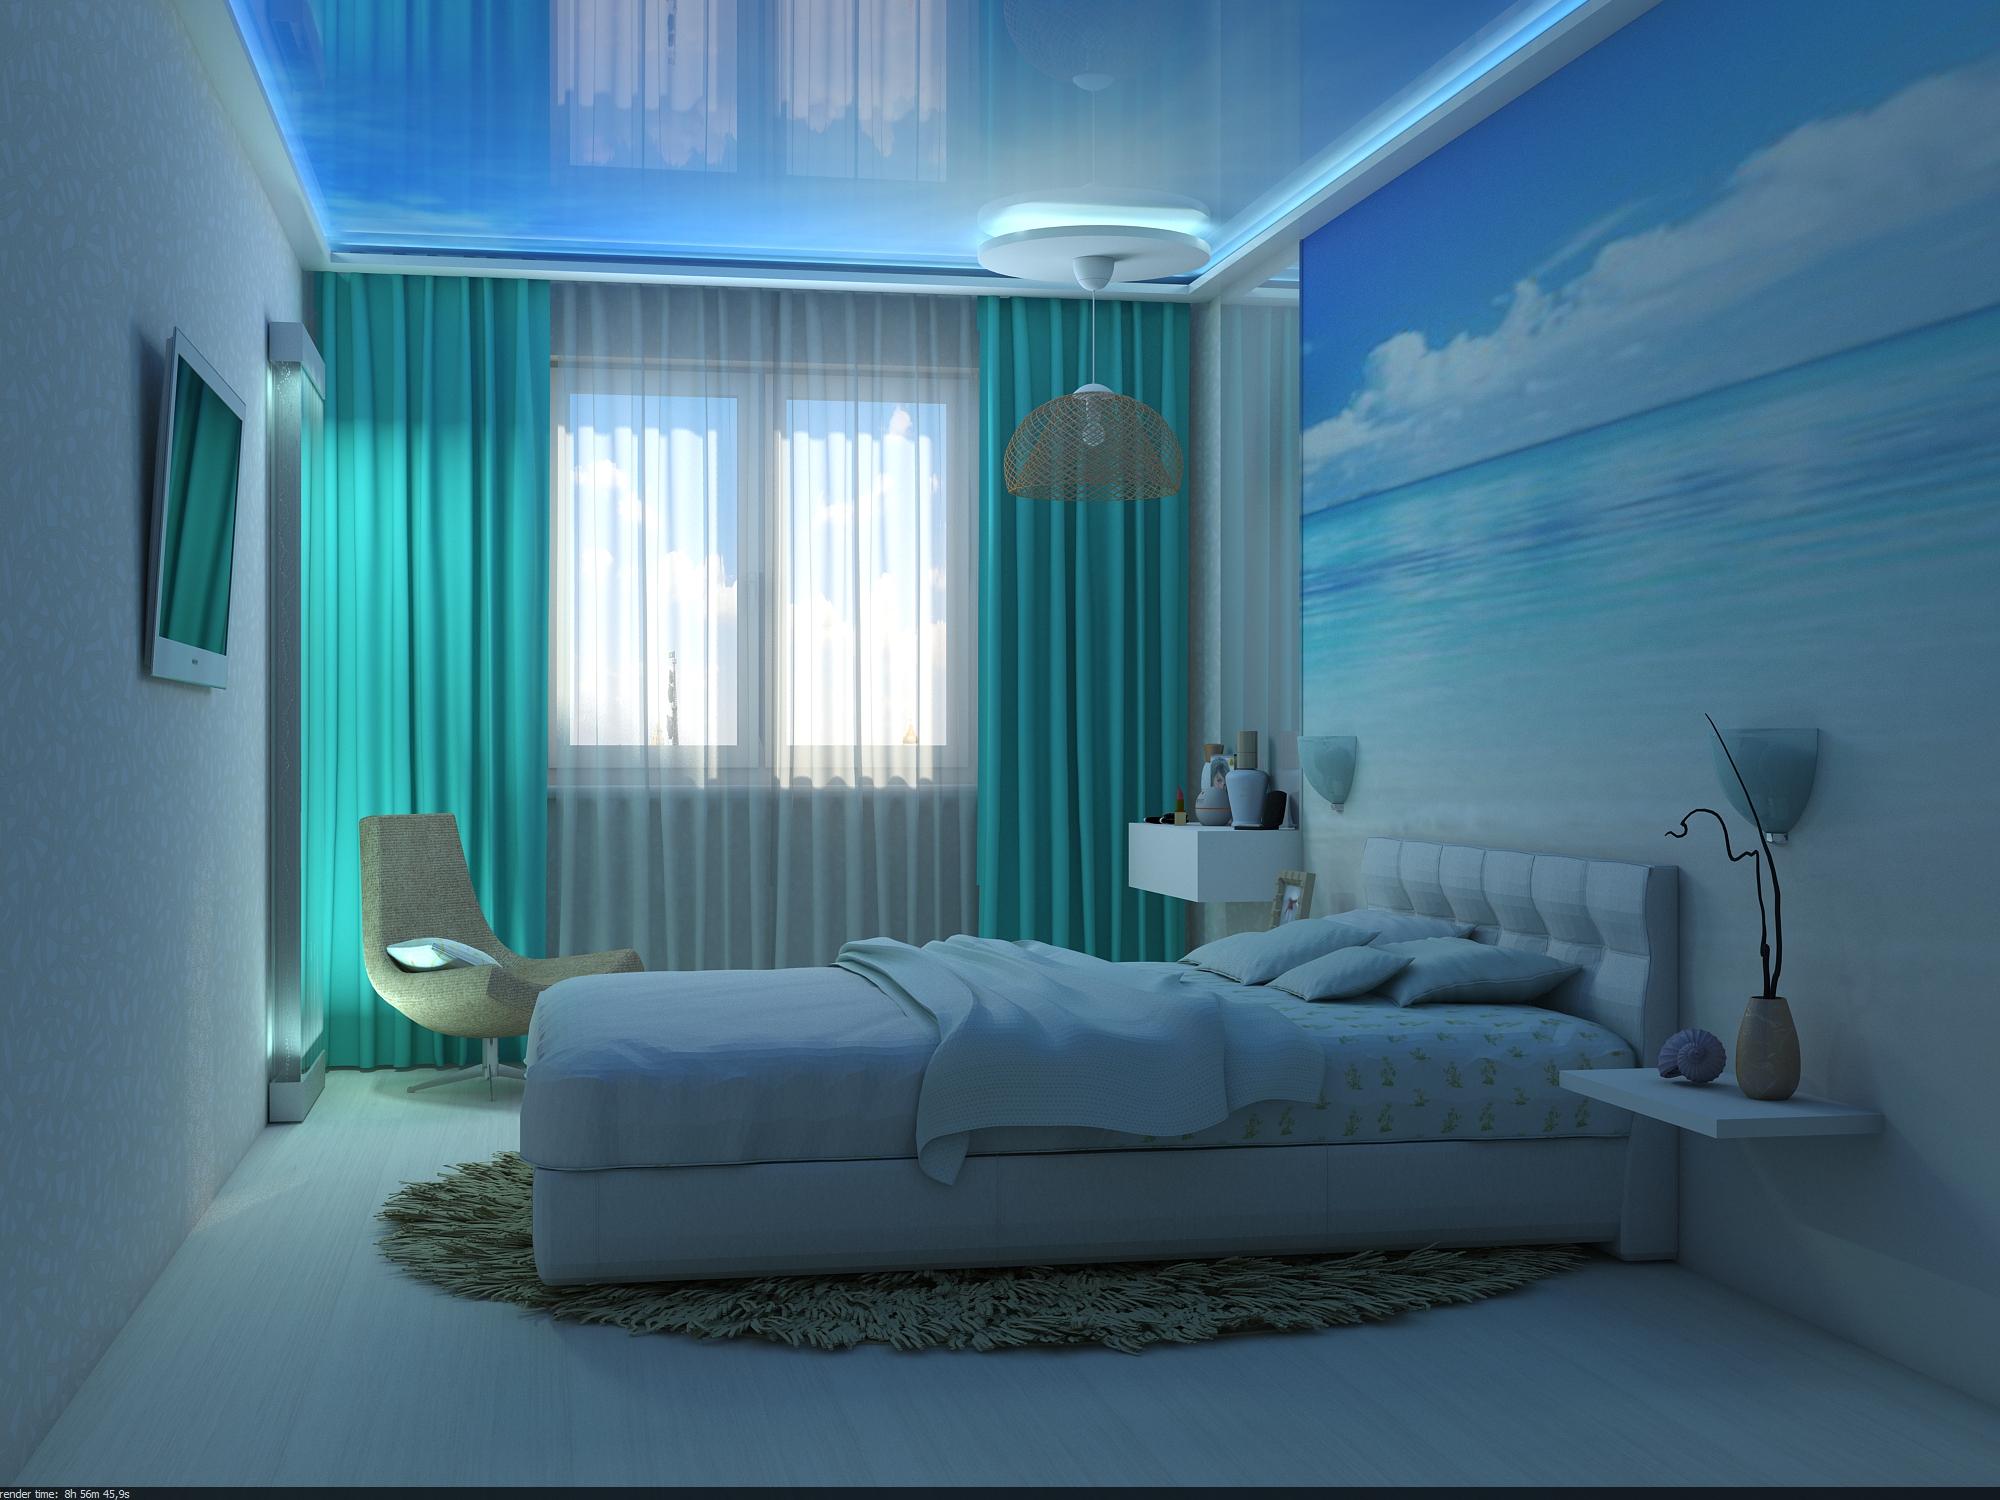 Интерьер комнат в голубом цвете